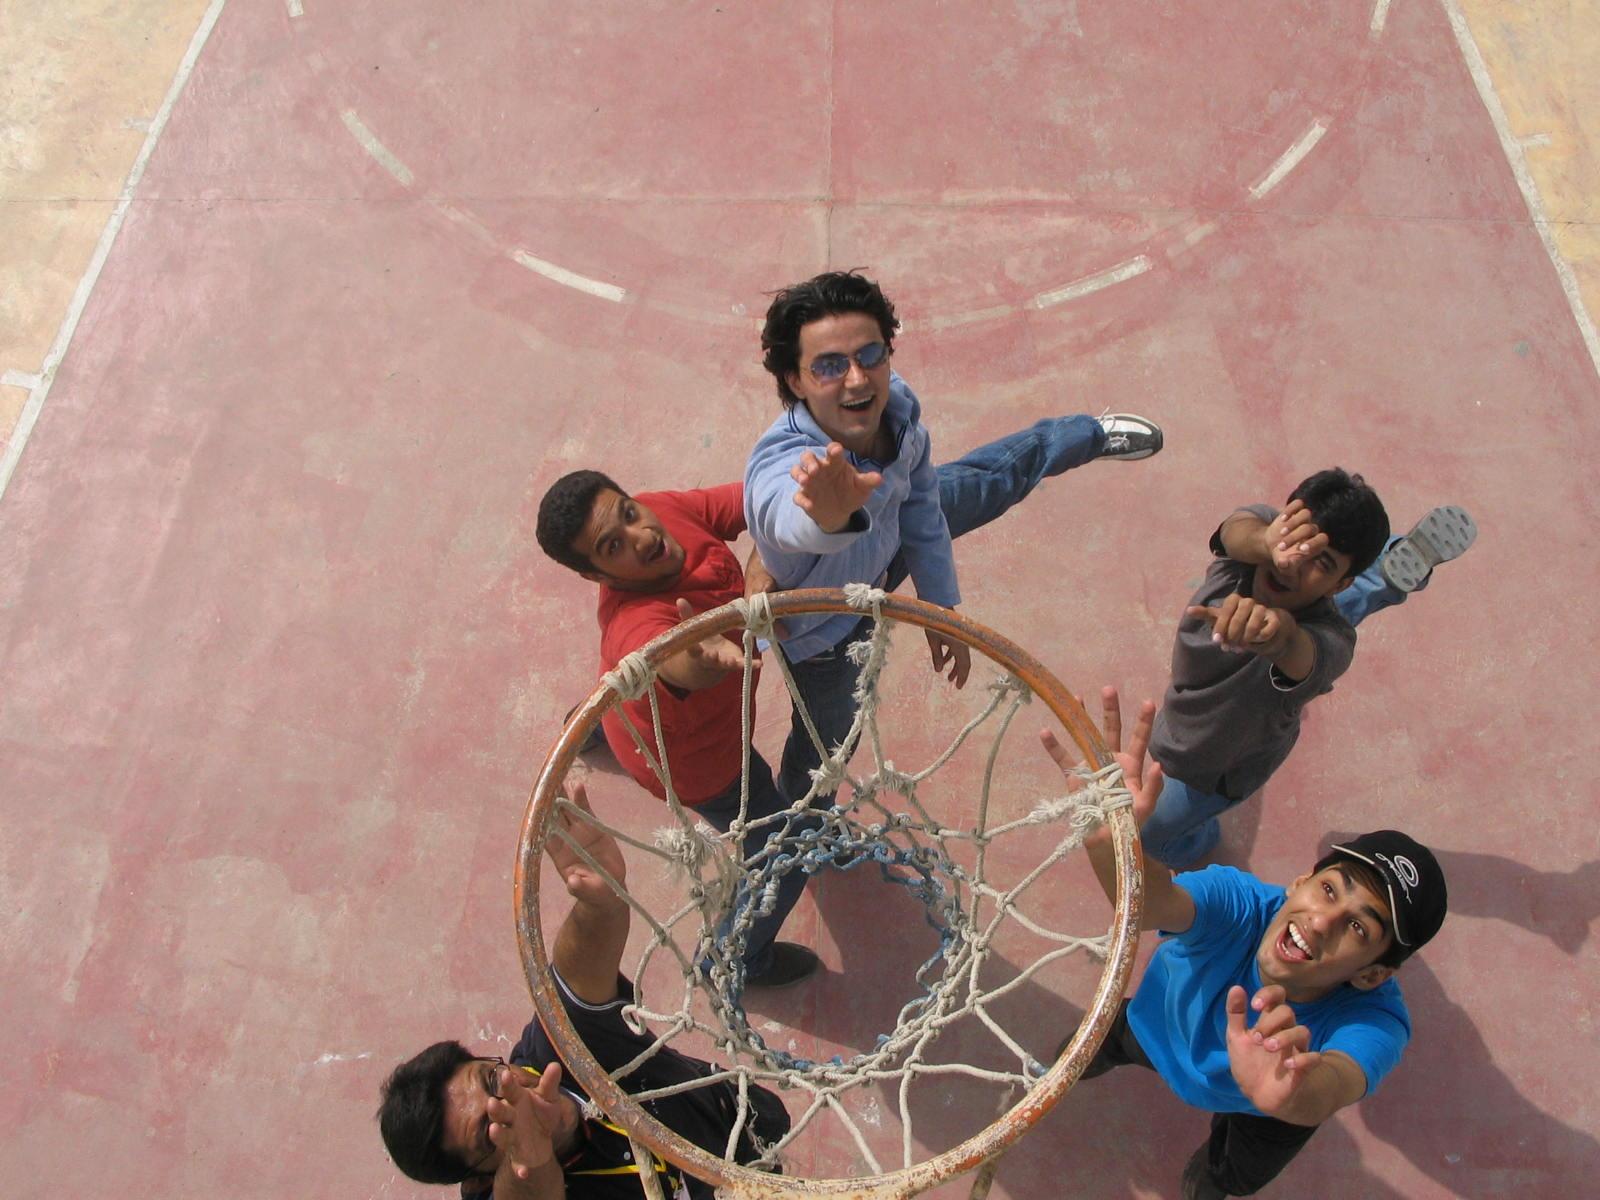 Playing basketball, Activity, Basketball, Bspo06, Game, HQ Photo